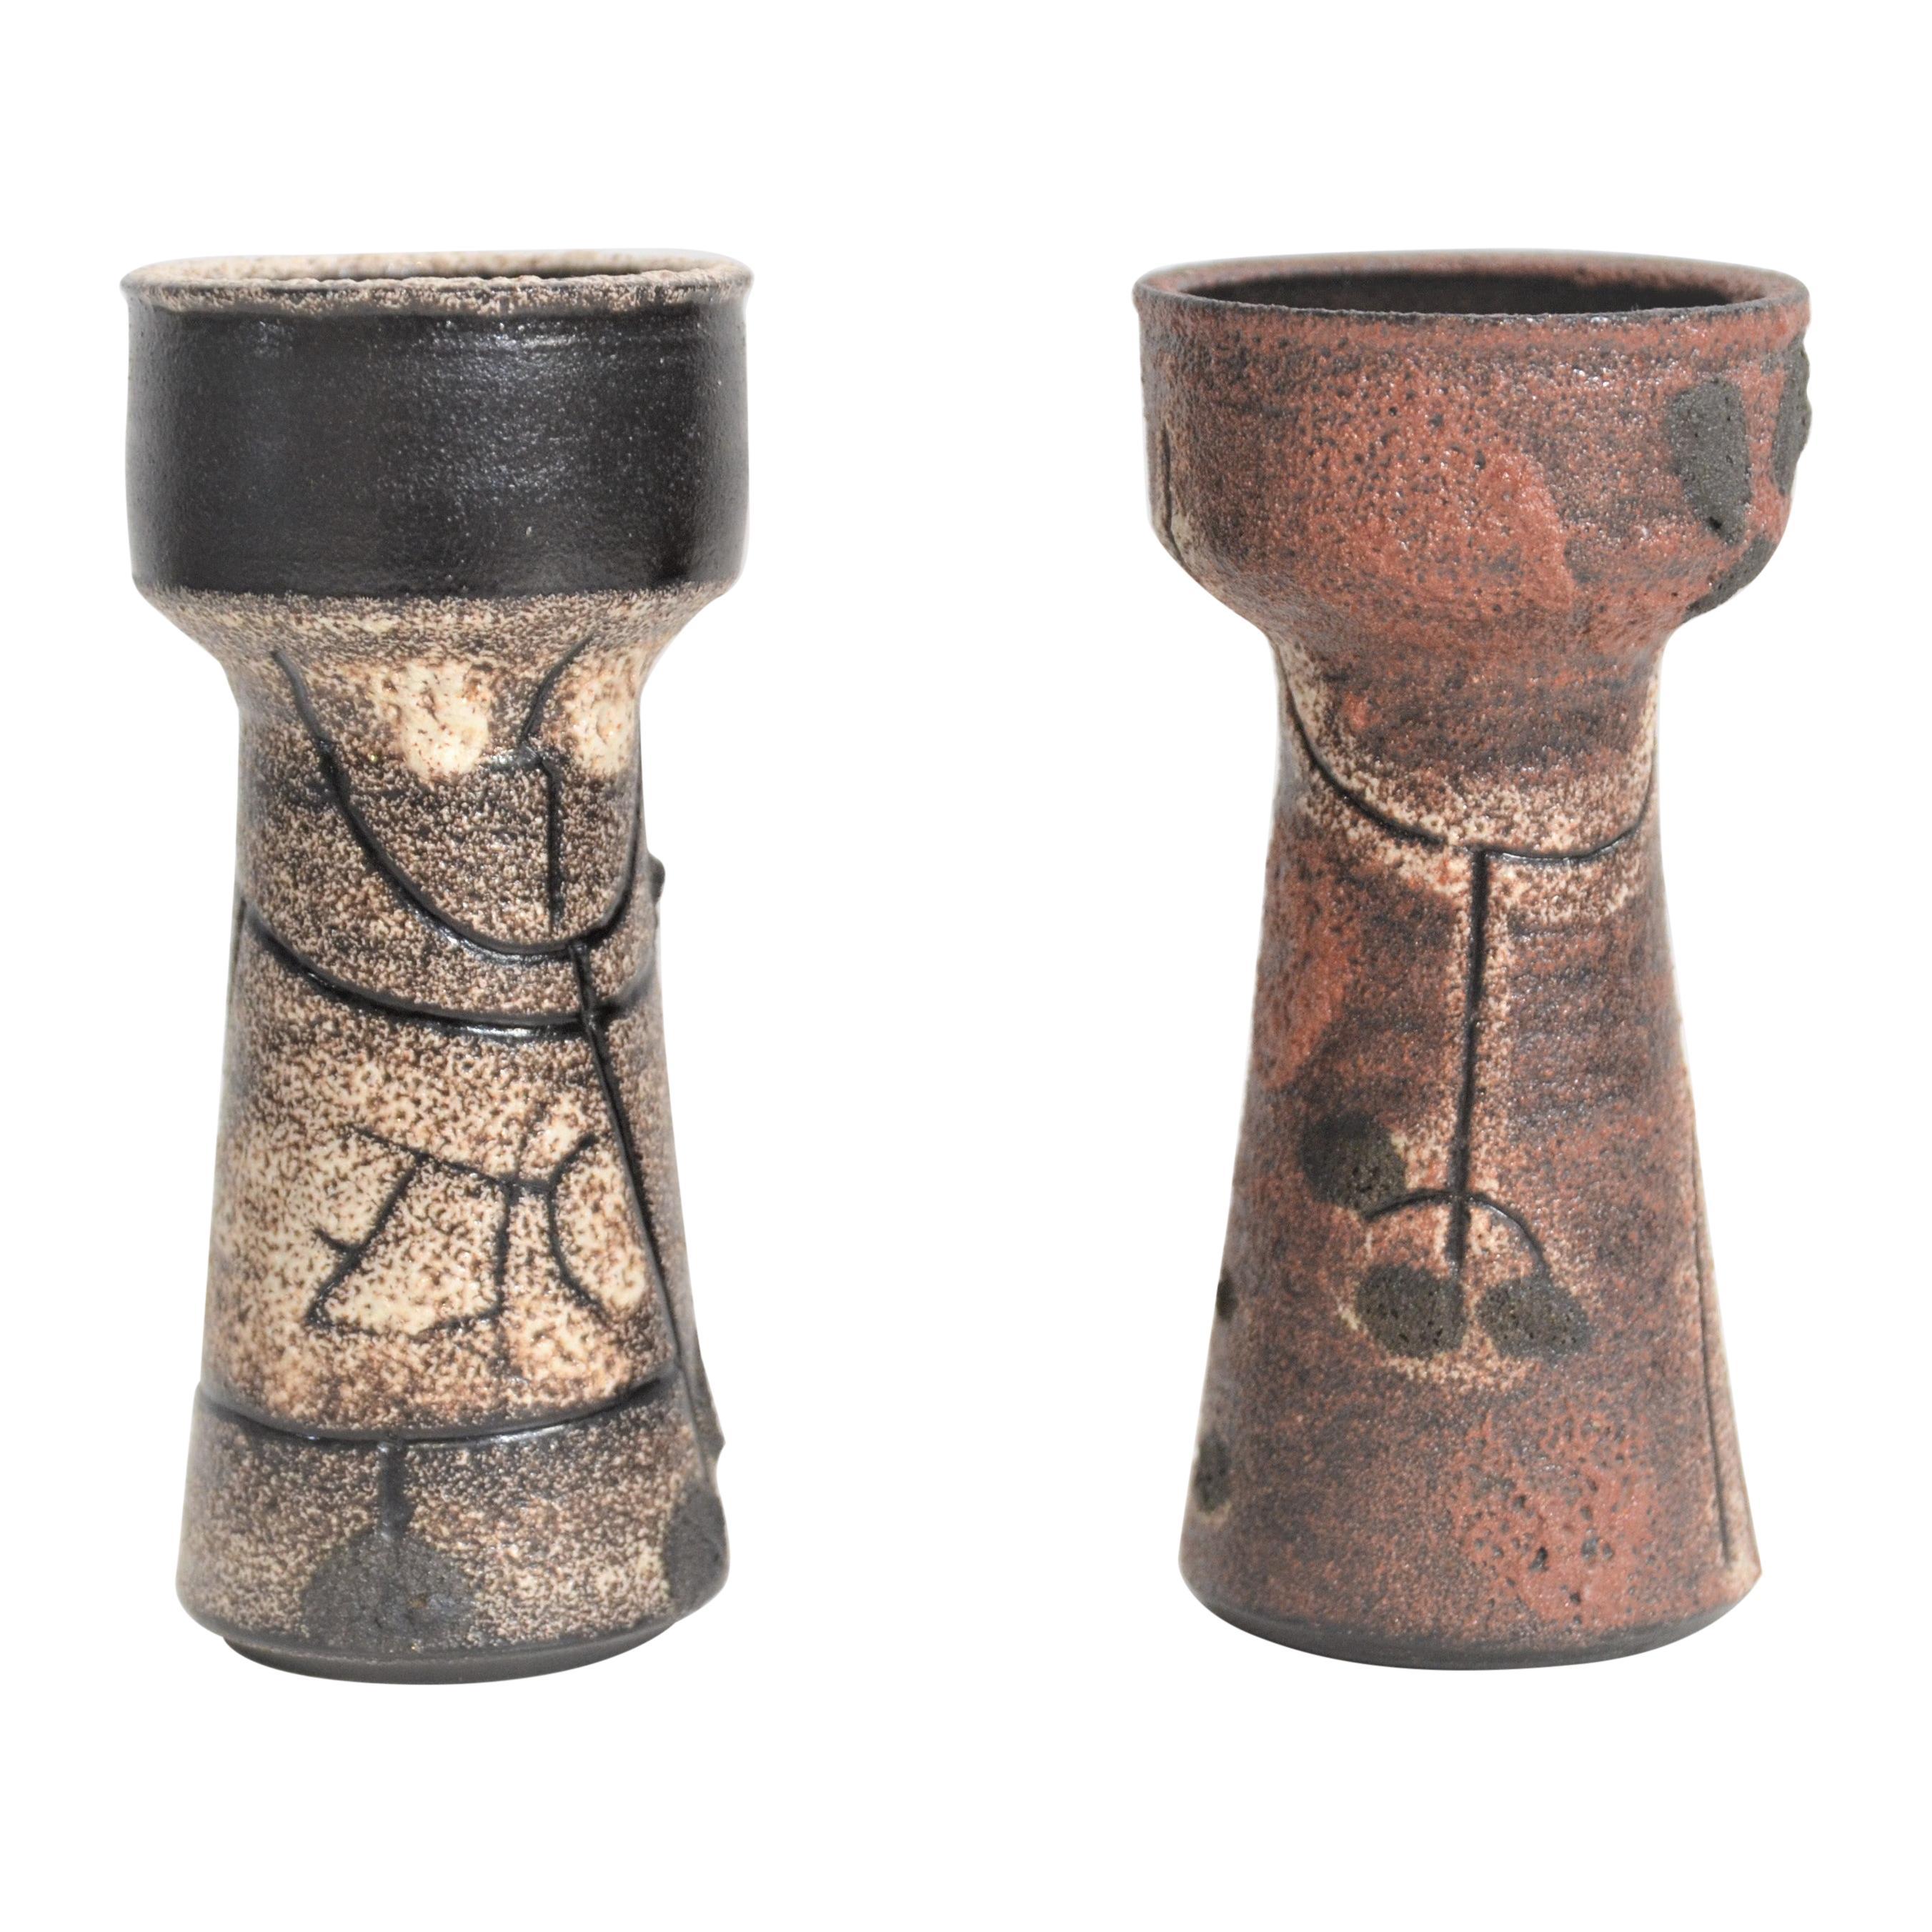 Earthenware Vases Jaap Domisse, Netherlands